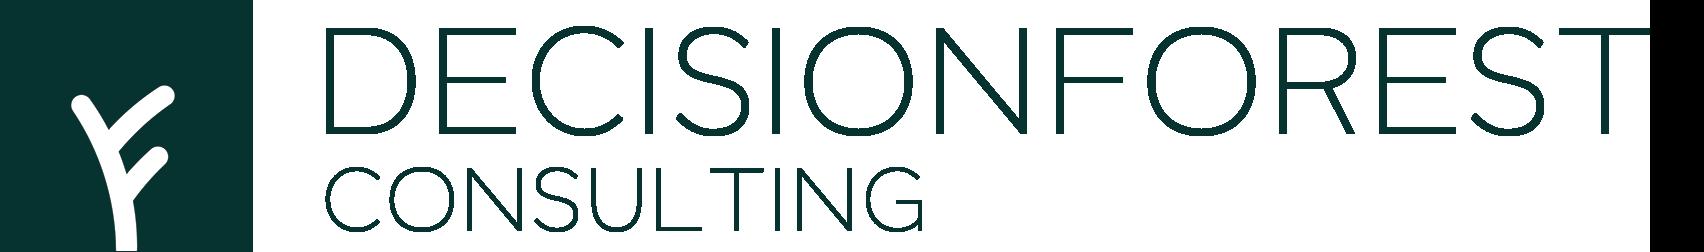 DecisionForest Consulting